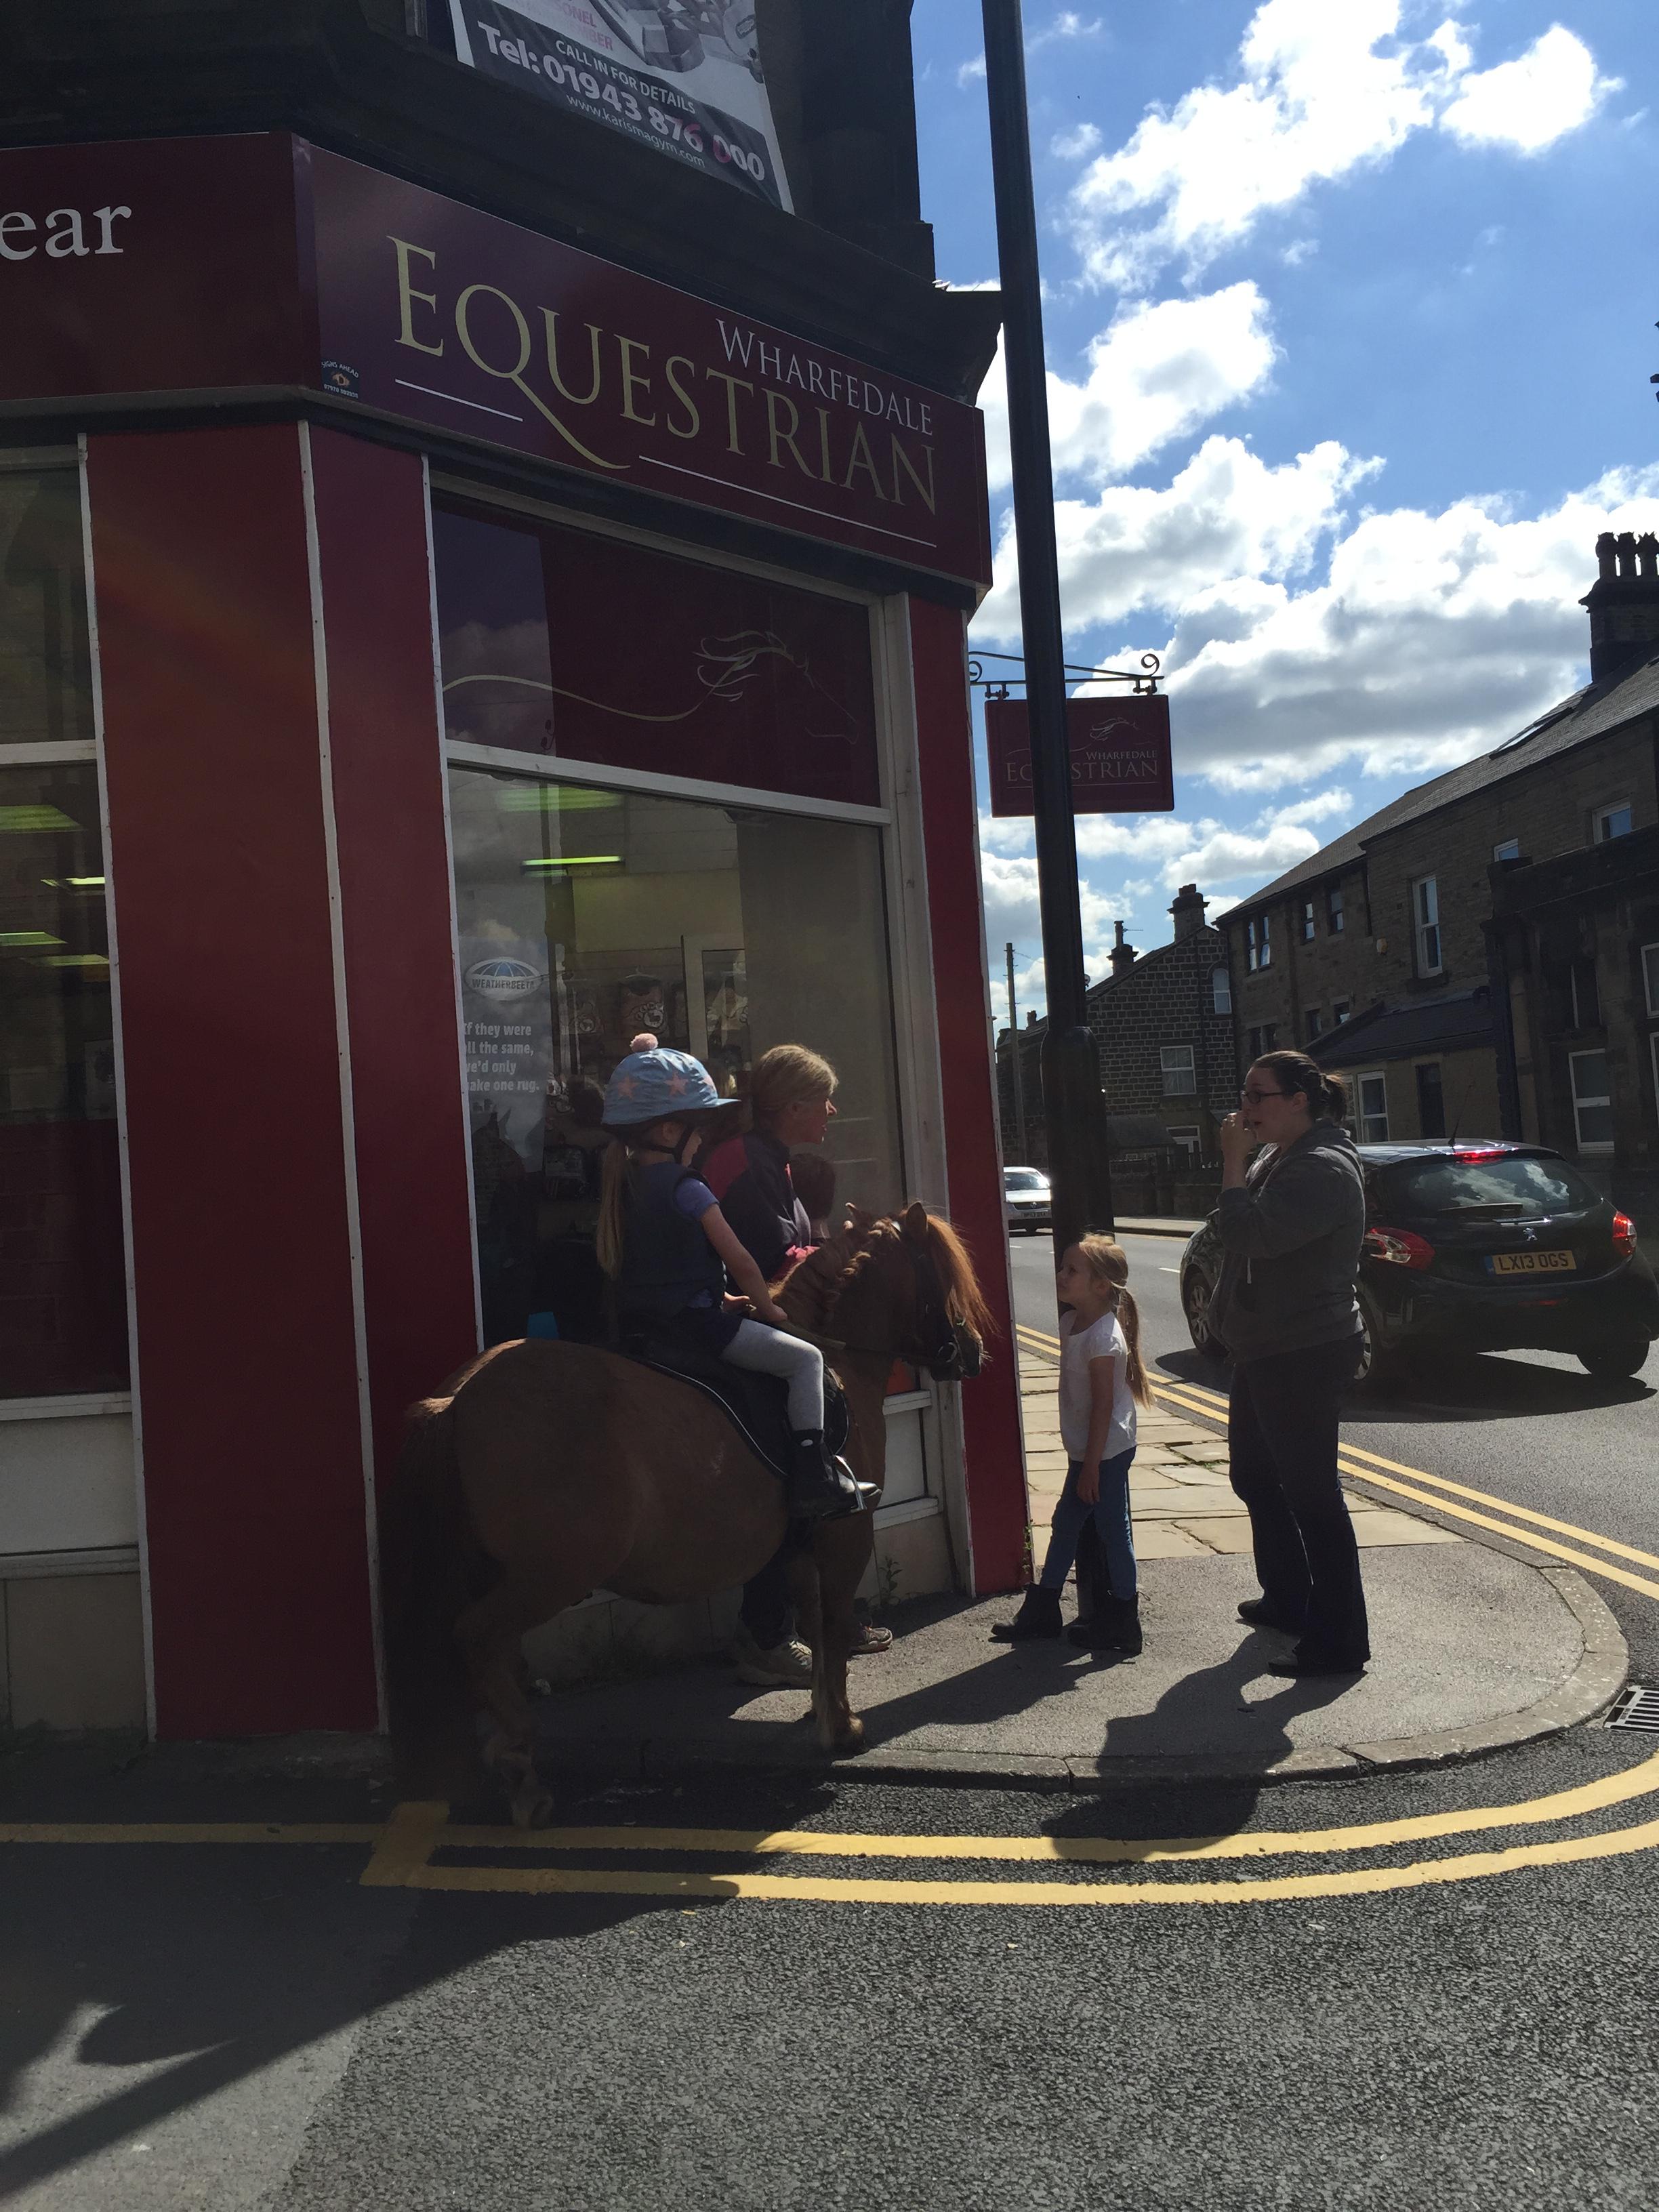 Wharfedale Equestrian Ltd